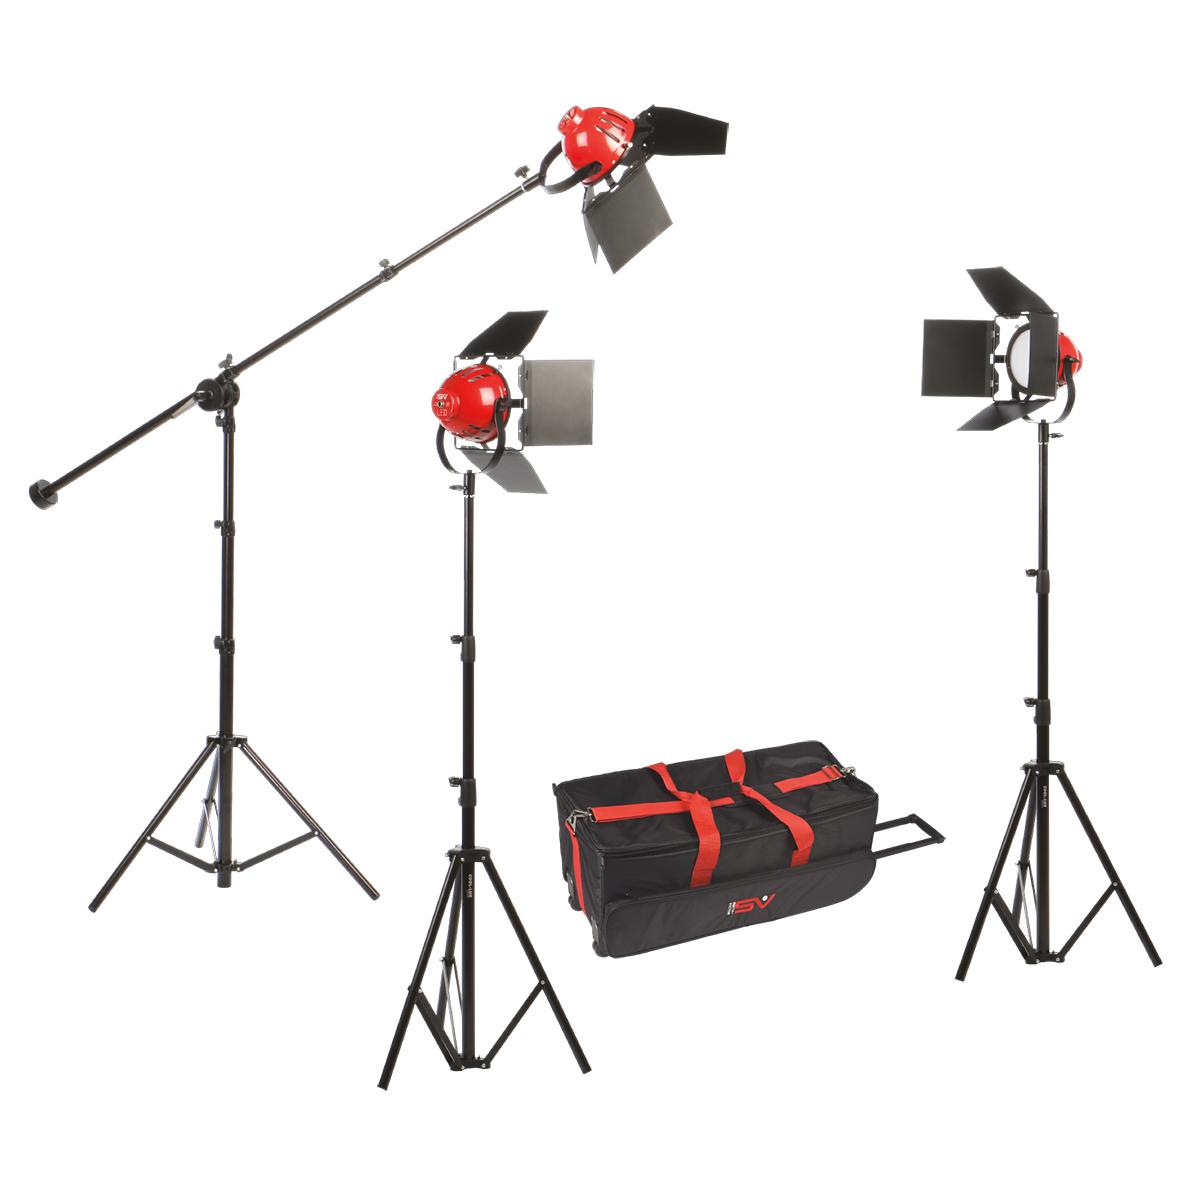 ladybug 1500 soft led 3 light kit1500 watt 3 point lighting kit with